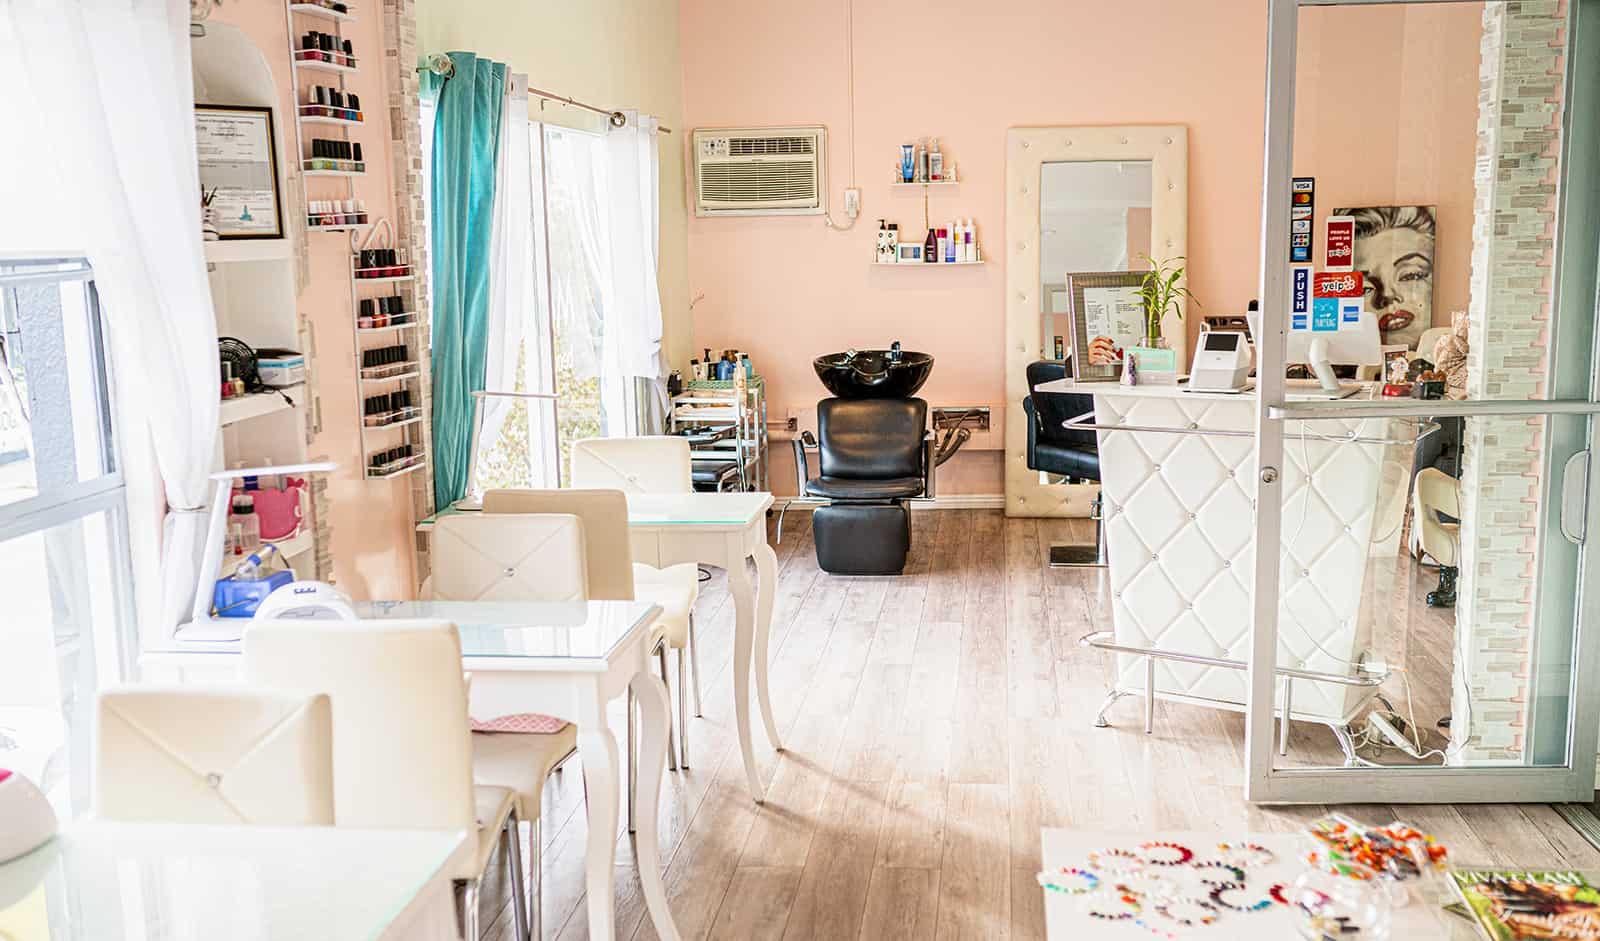 melrose-beauty-bar-main-image